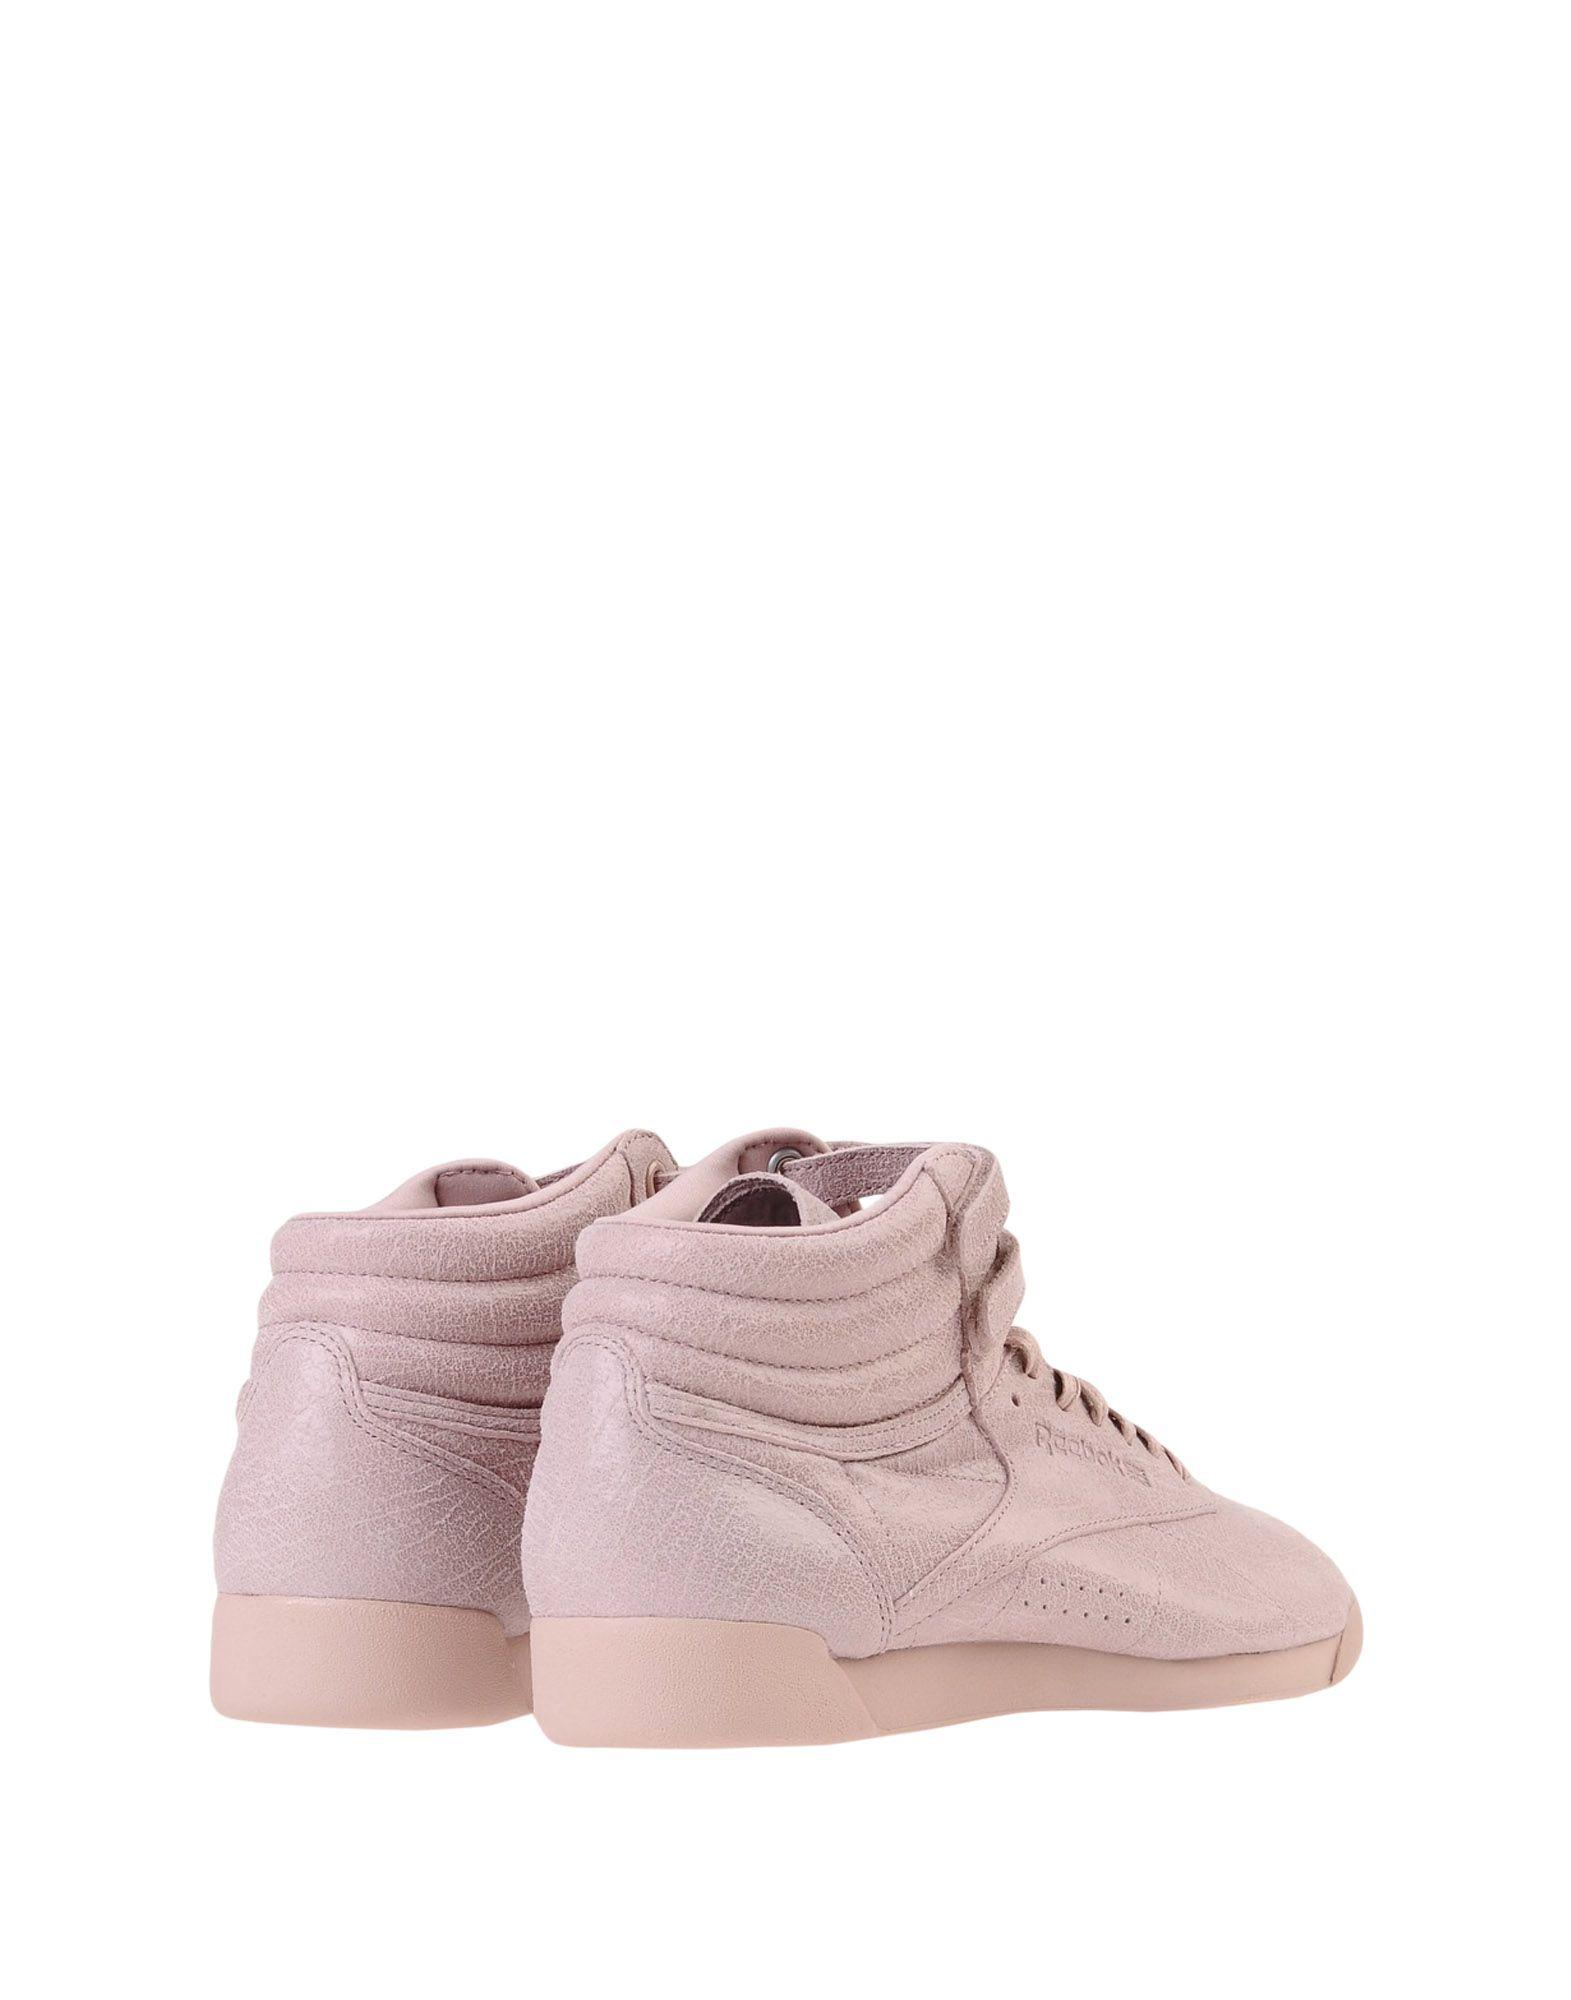 Reebok 11451561NU F/S Hi Fbt  11451561NU Reebok Gute Qualität beliebte Schuhe bf0037